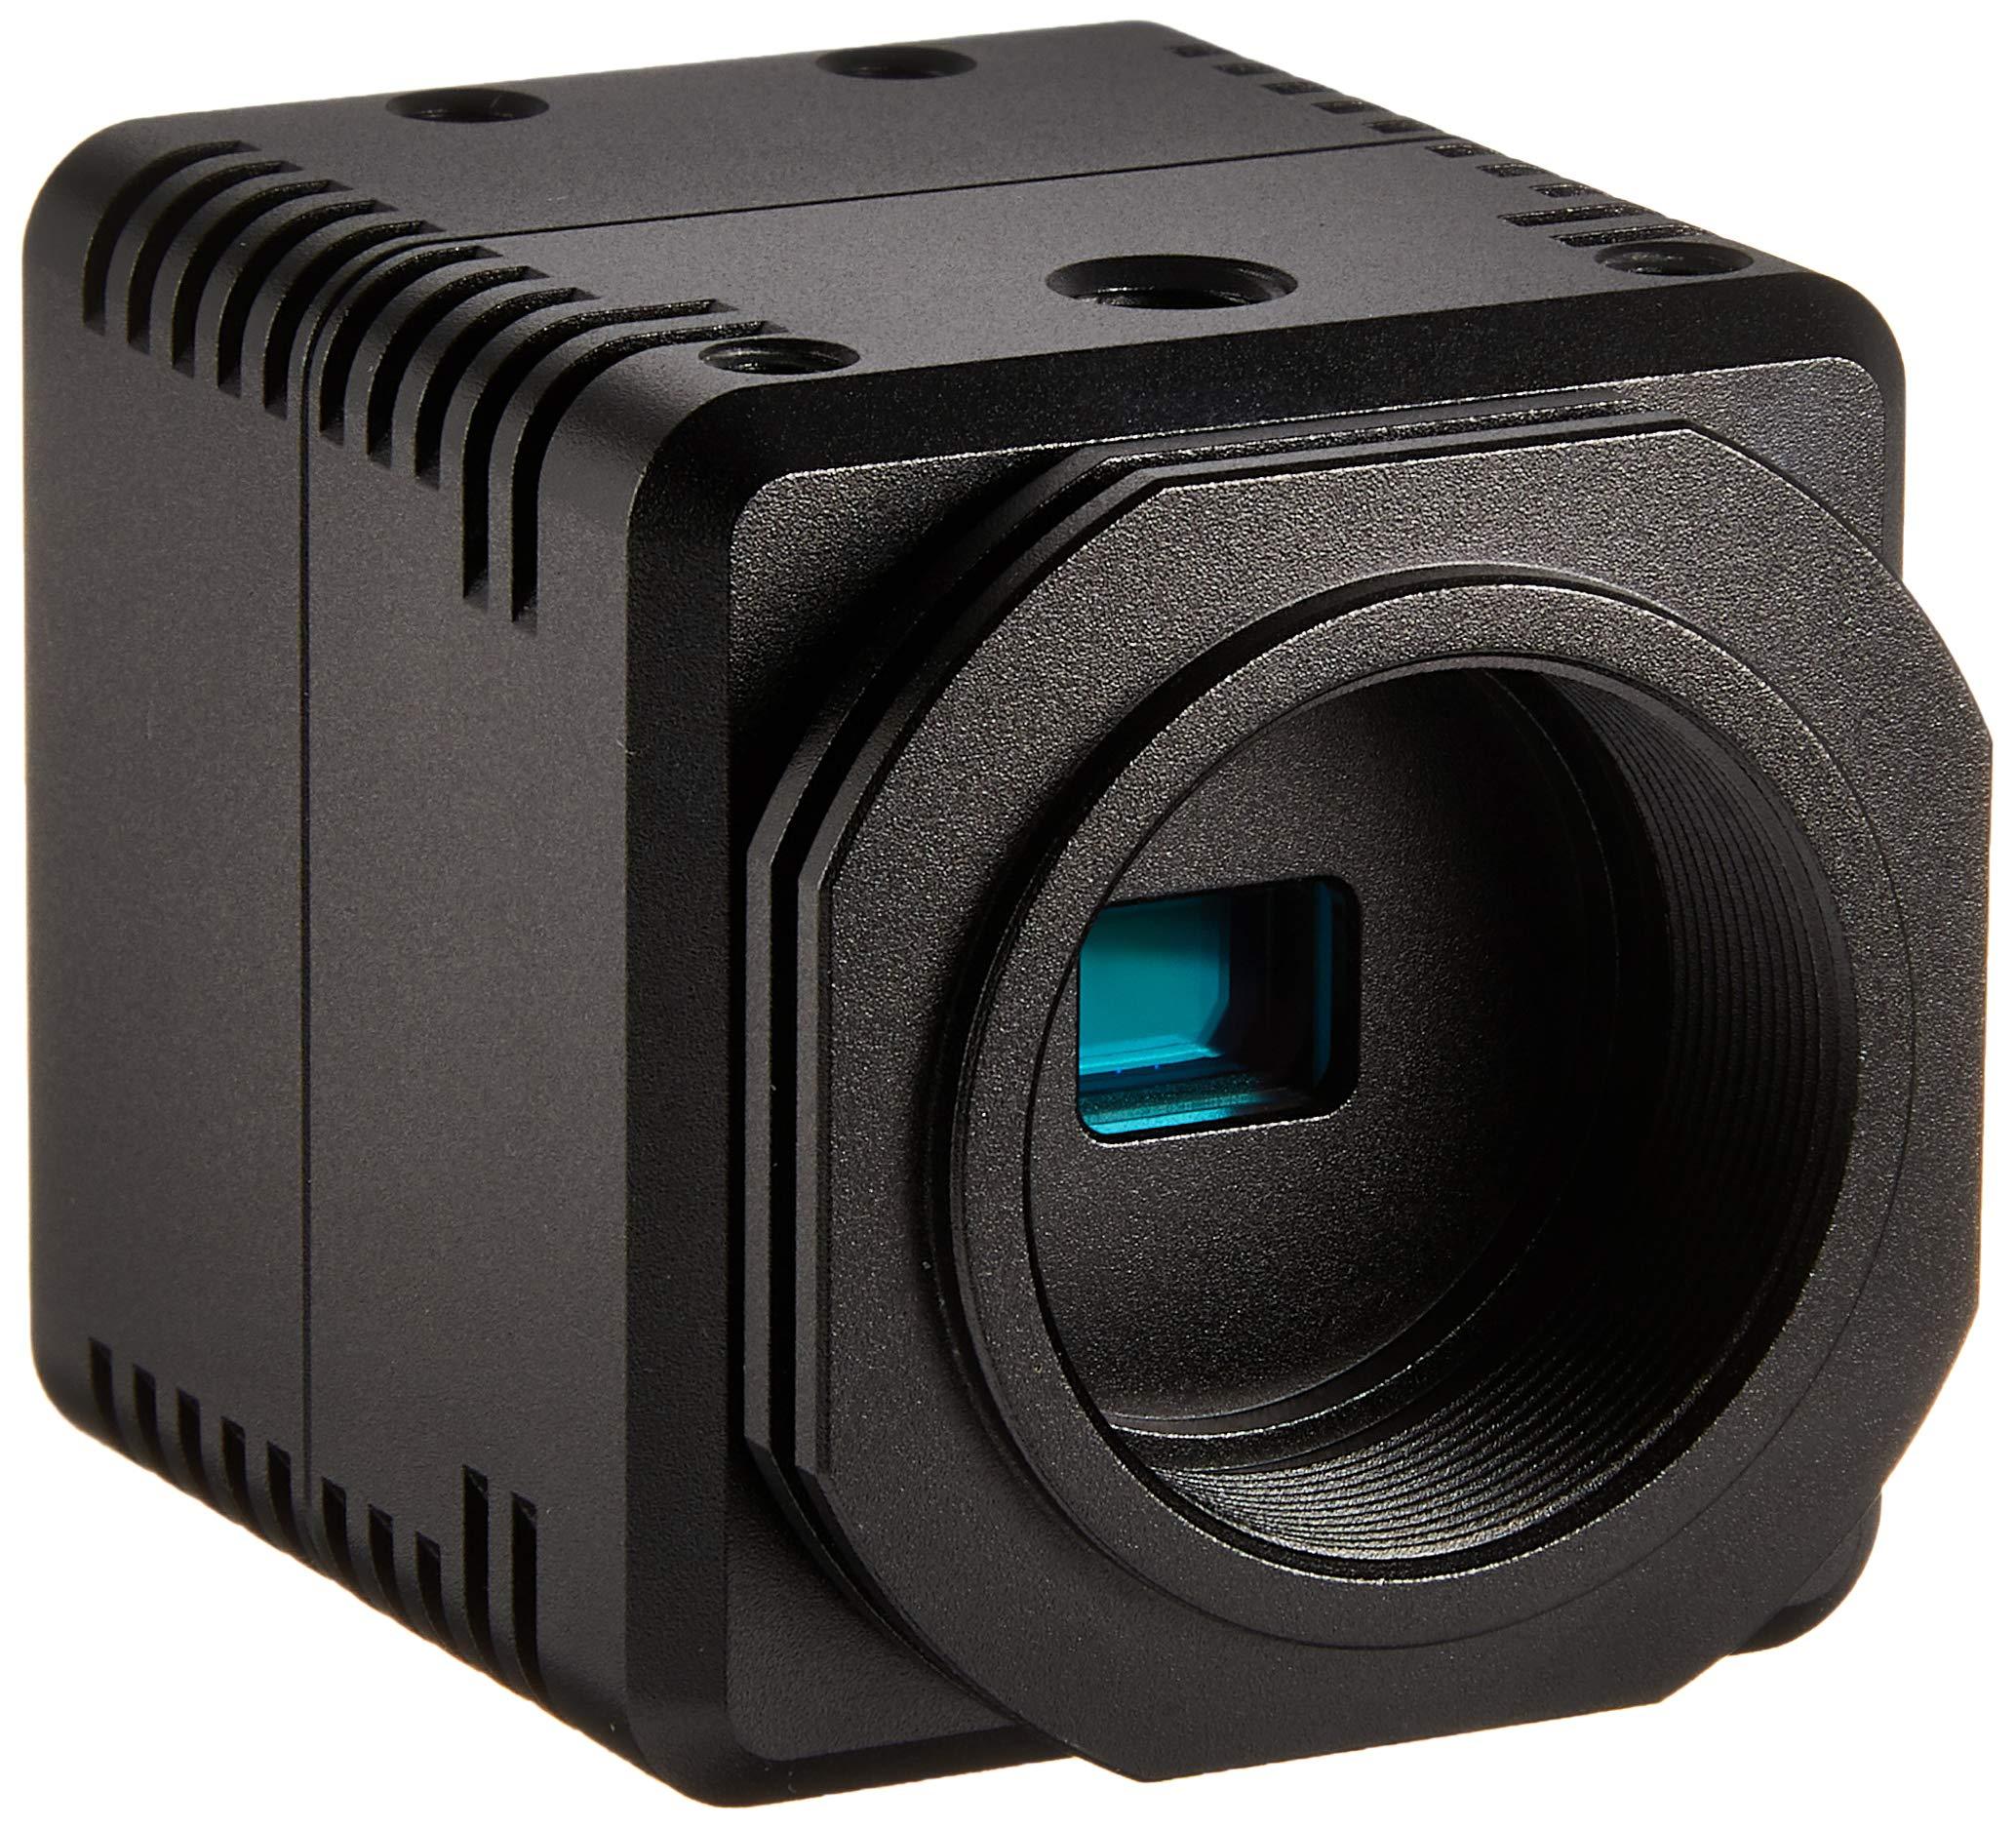 OMRON (Omron) Industrial Cameras 3Z4S-CA STC-HD203DV